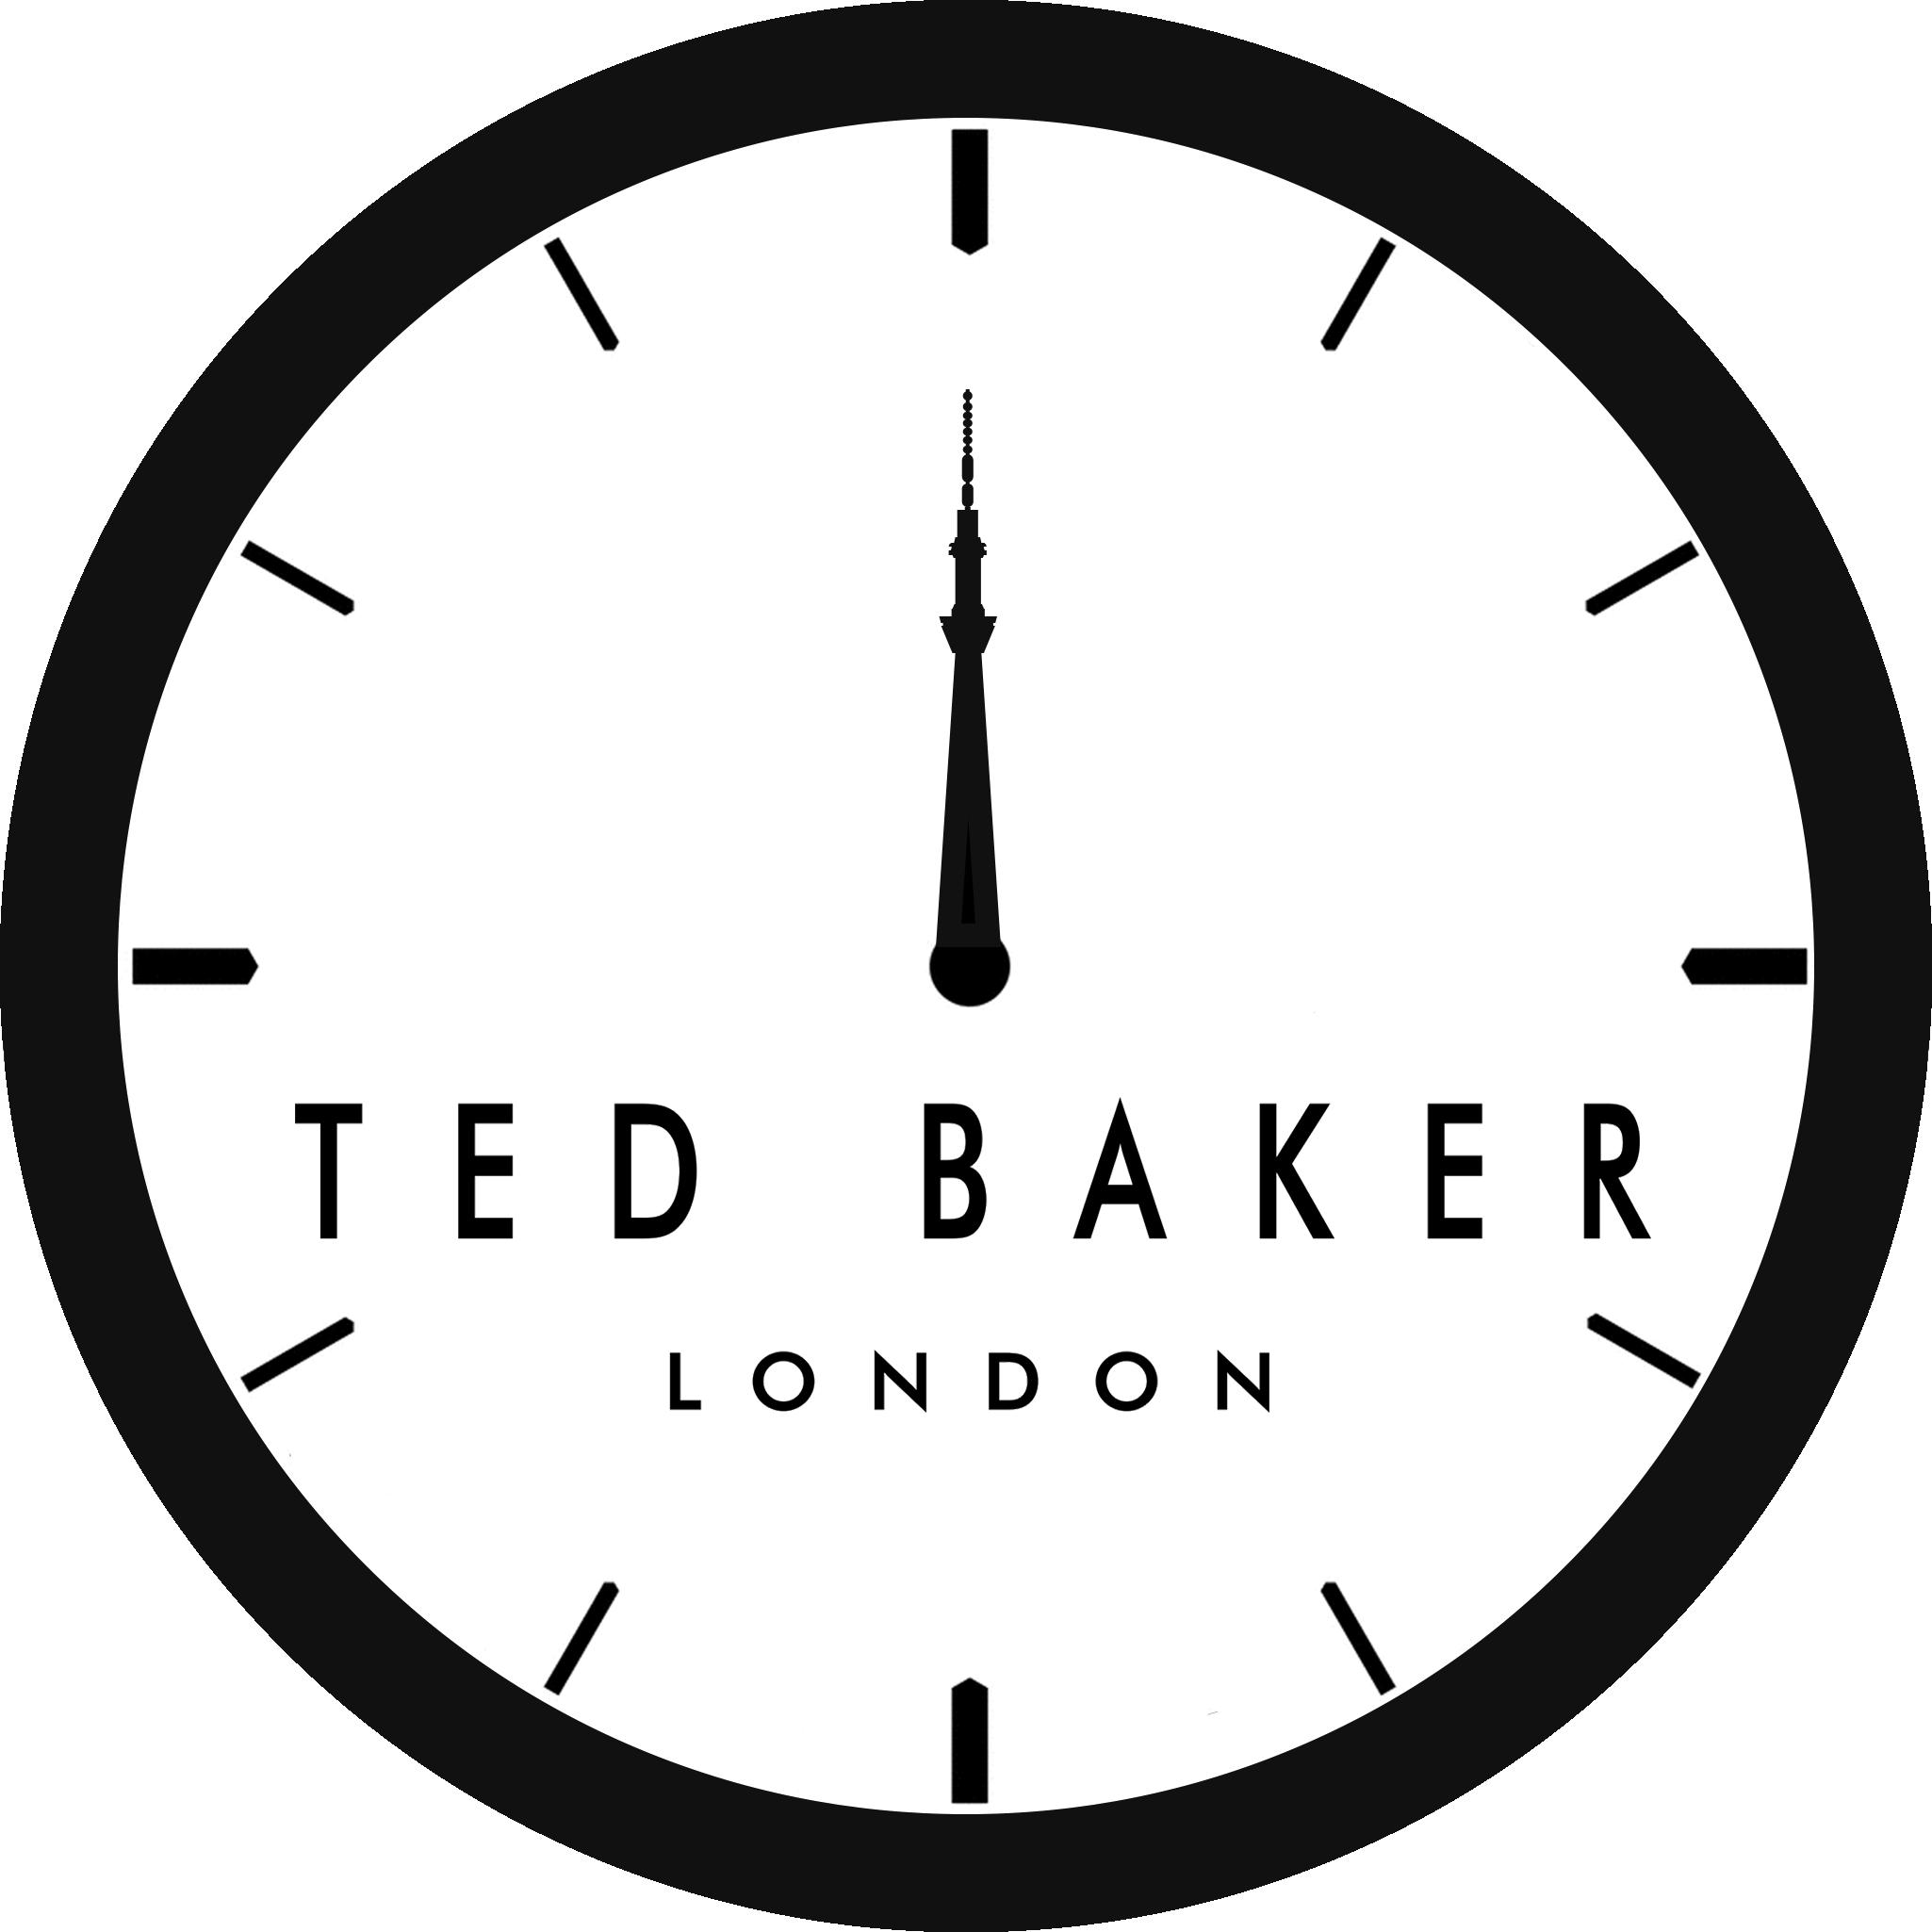 Ted baker logo clipart clip art download Hoverboard » Ayumilk_91 clip art download